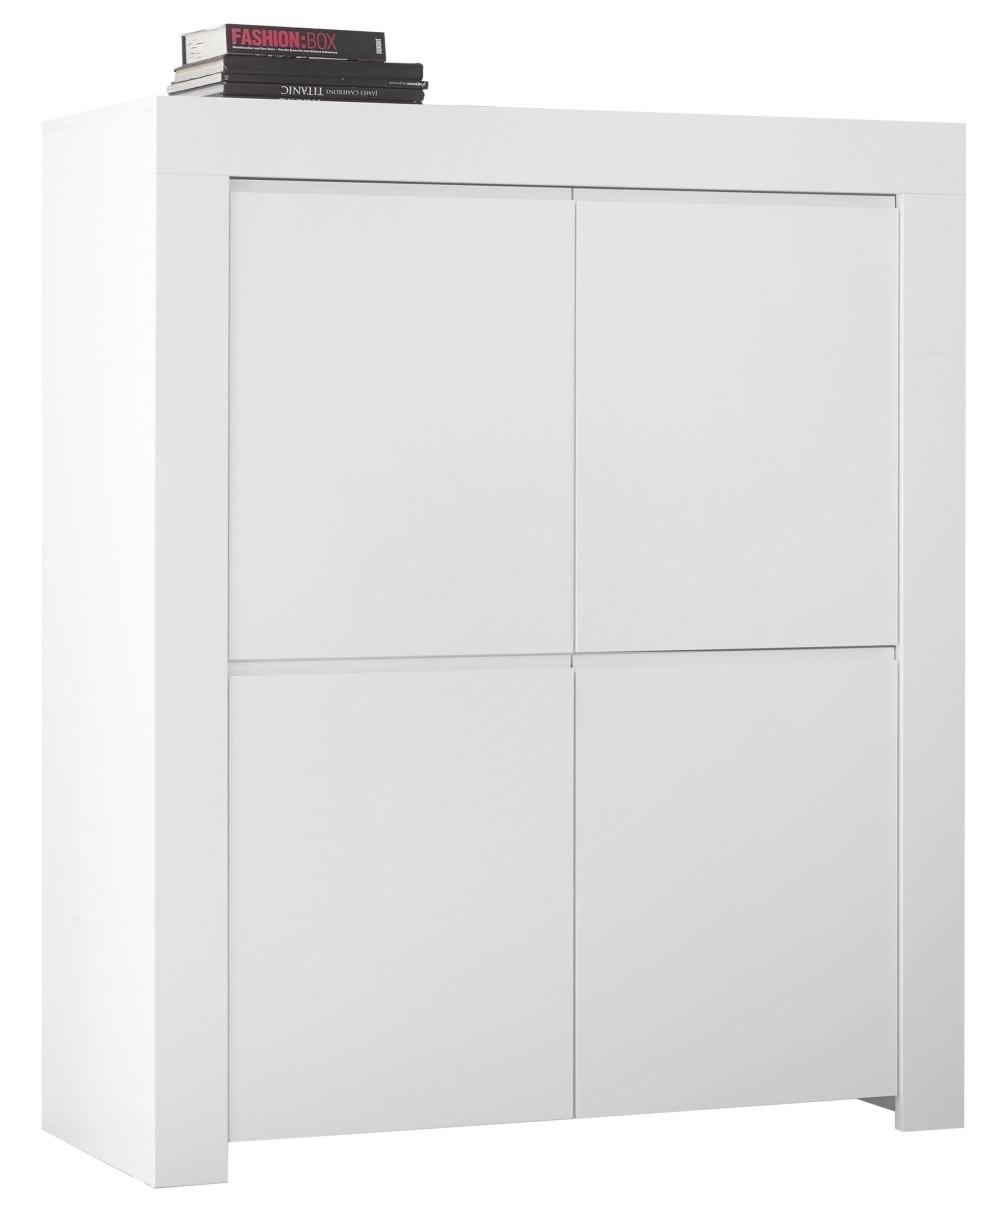 Opbergkast Firenze 140 cm hoog in mat wit